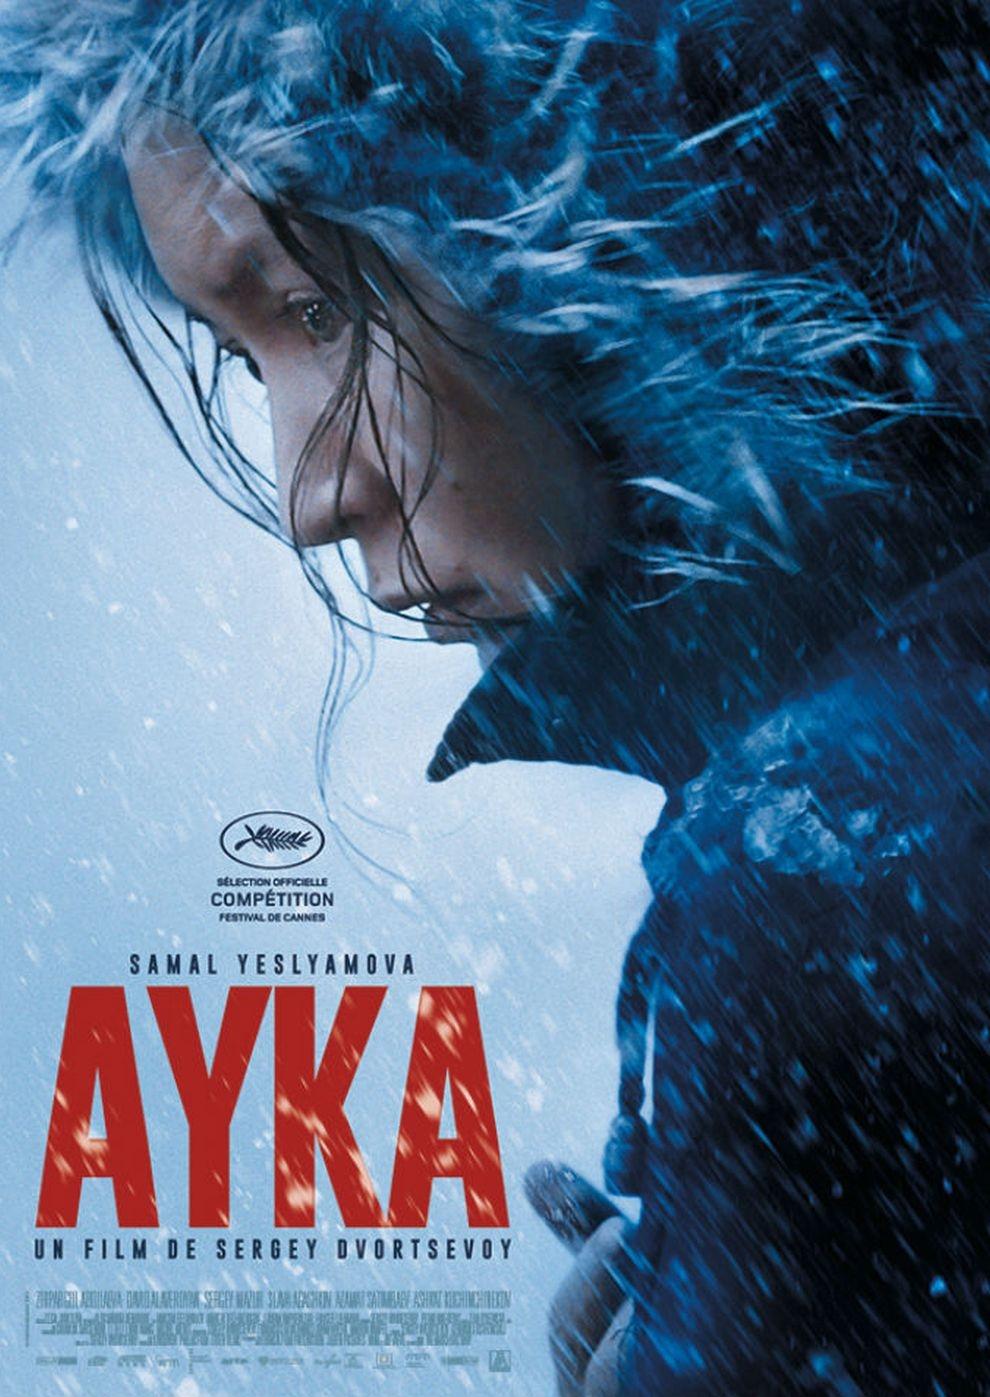 Ayka (Poster)